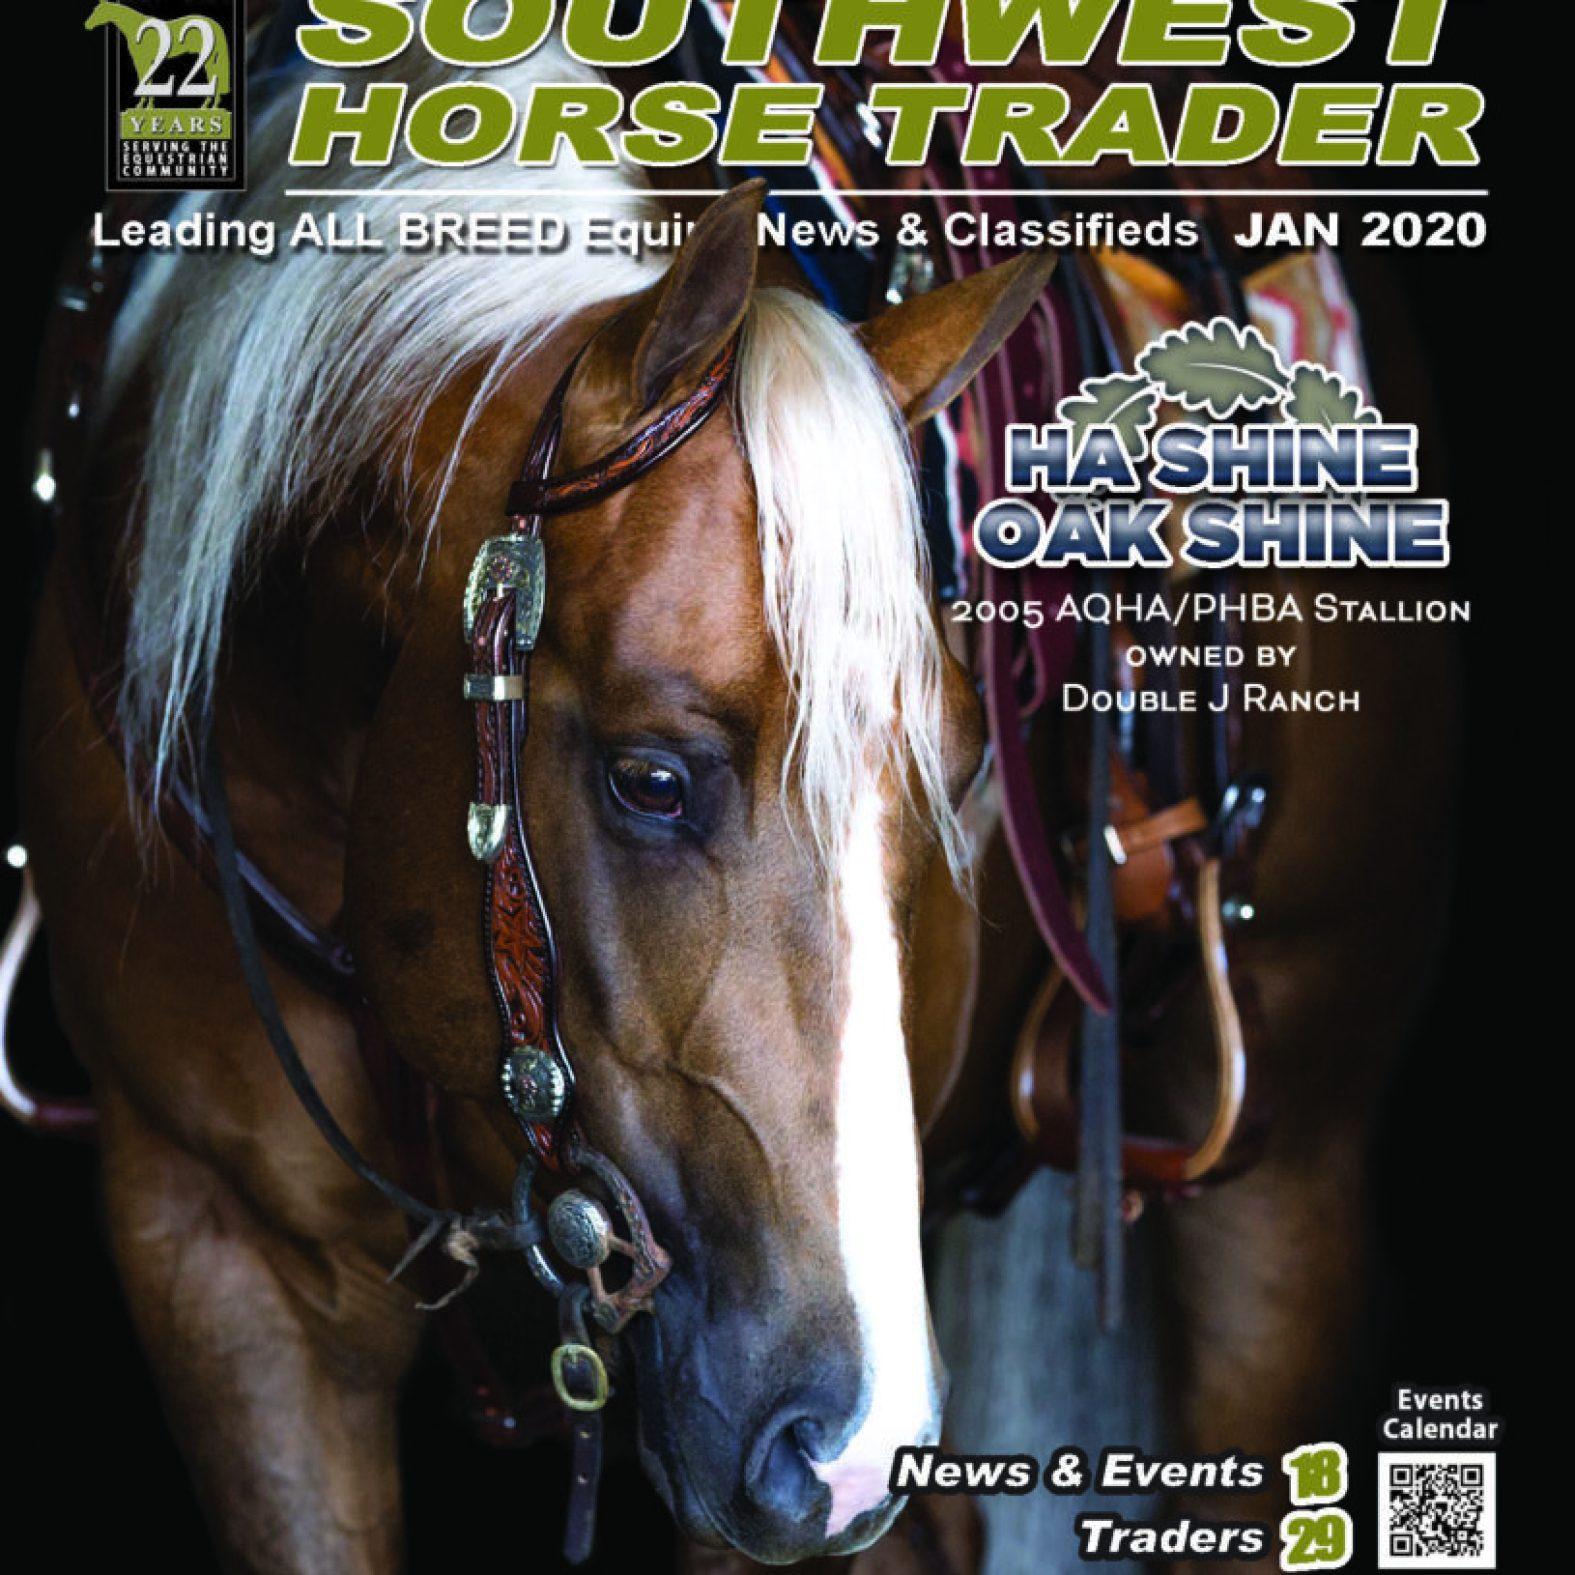 SouthWest Horse Trader January 2020 Issue